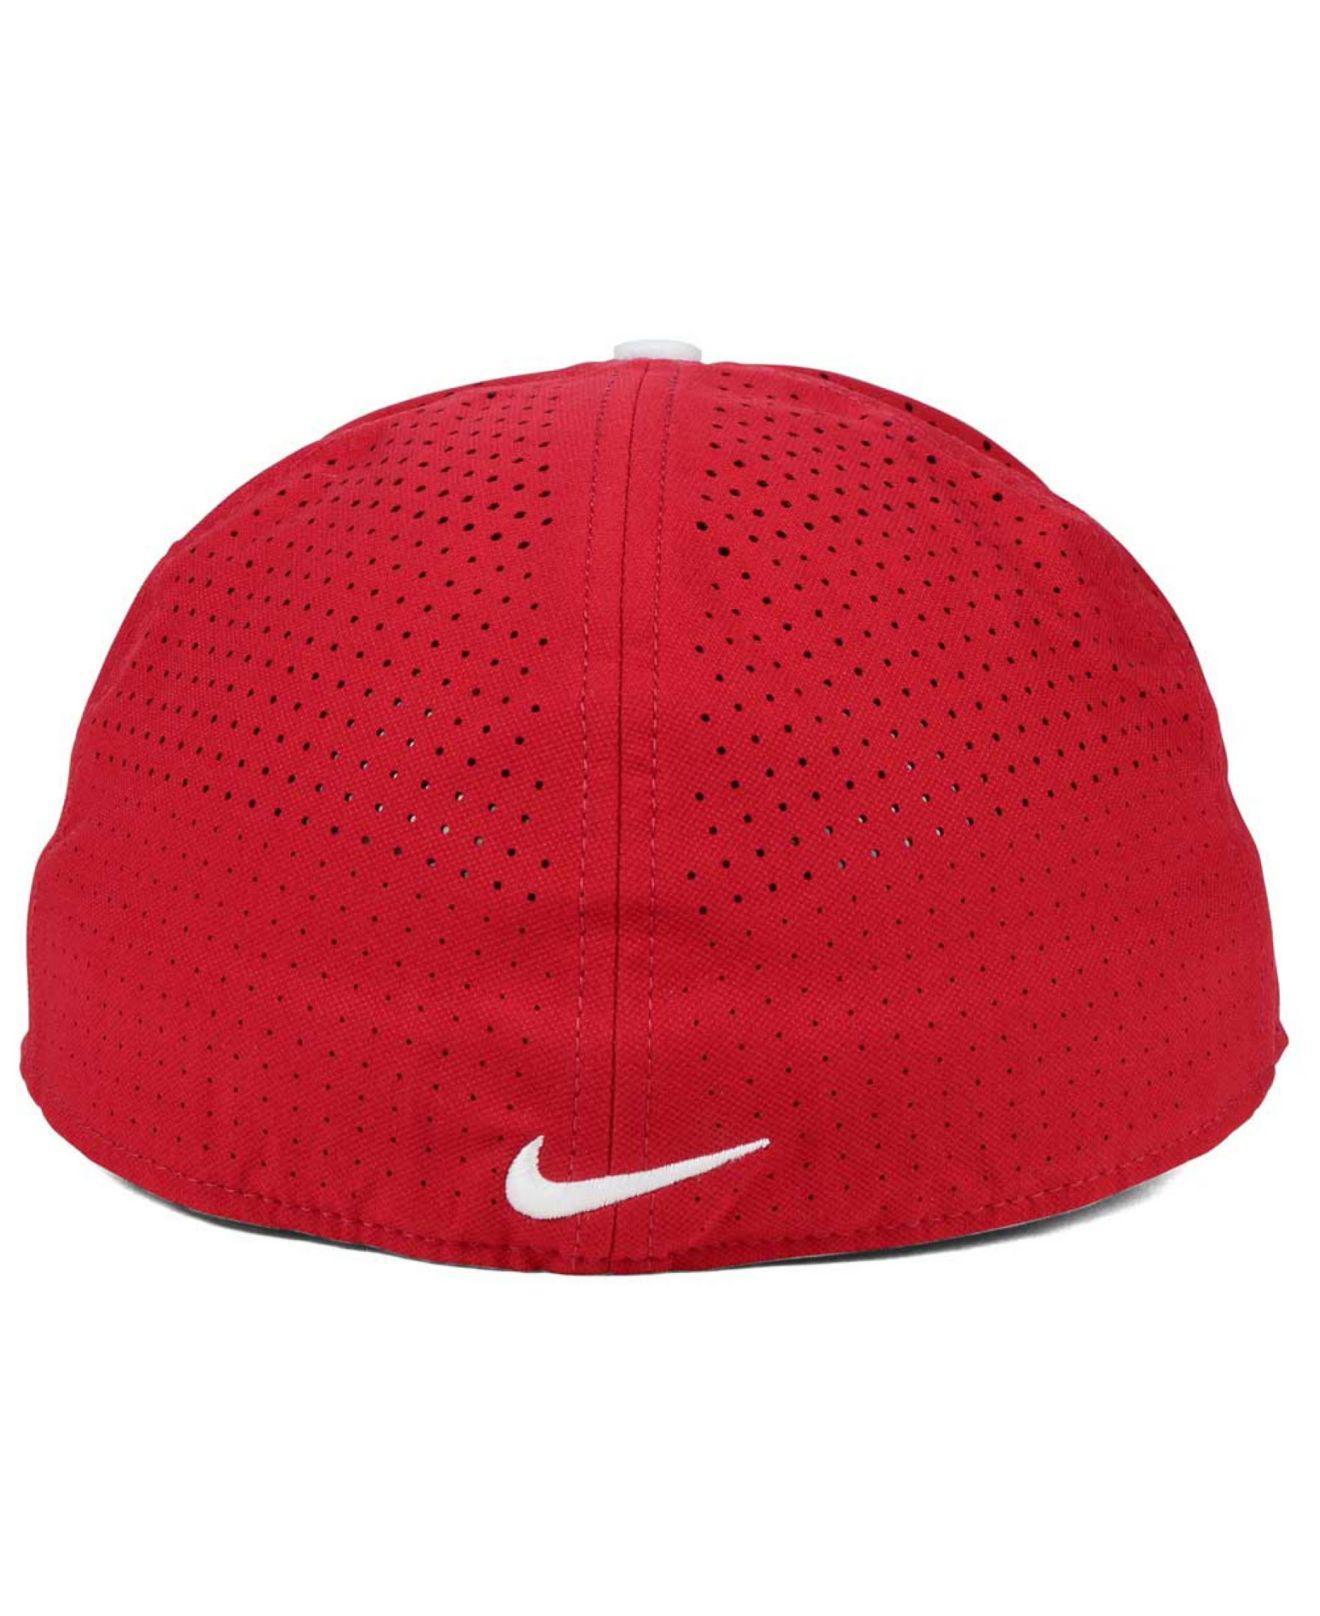 timeless design 48c8a 55435 ... hot nike red alabama crimson tide true vapor fitted cap for men lyst.  view fullscreen